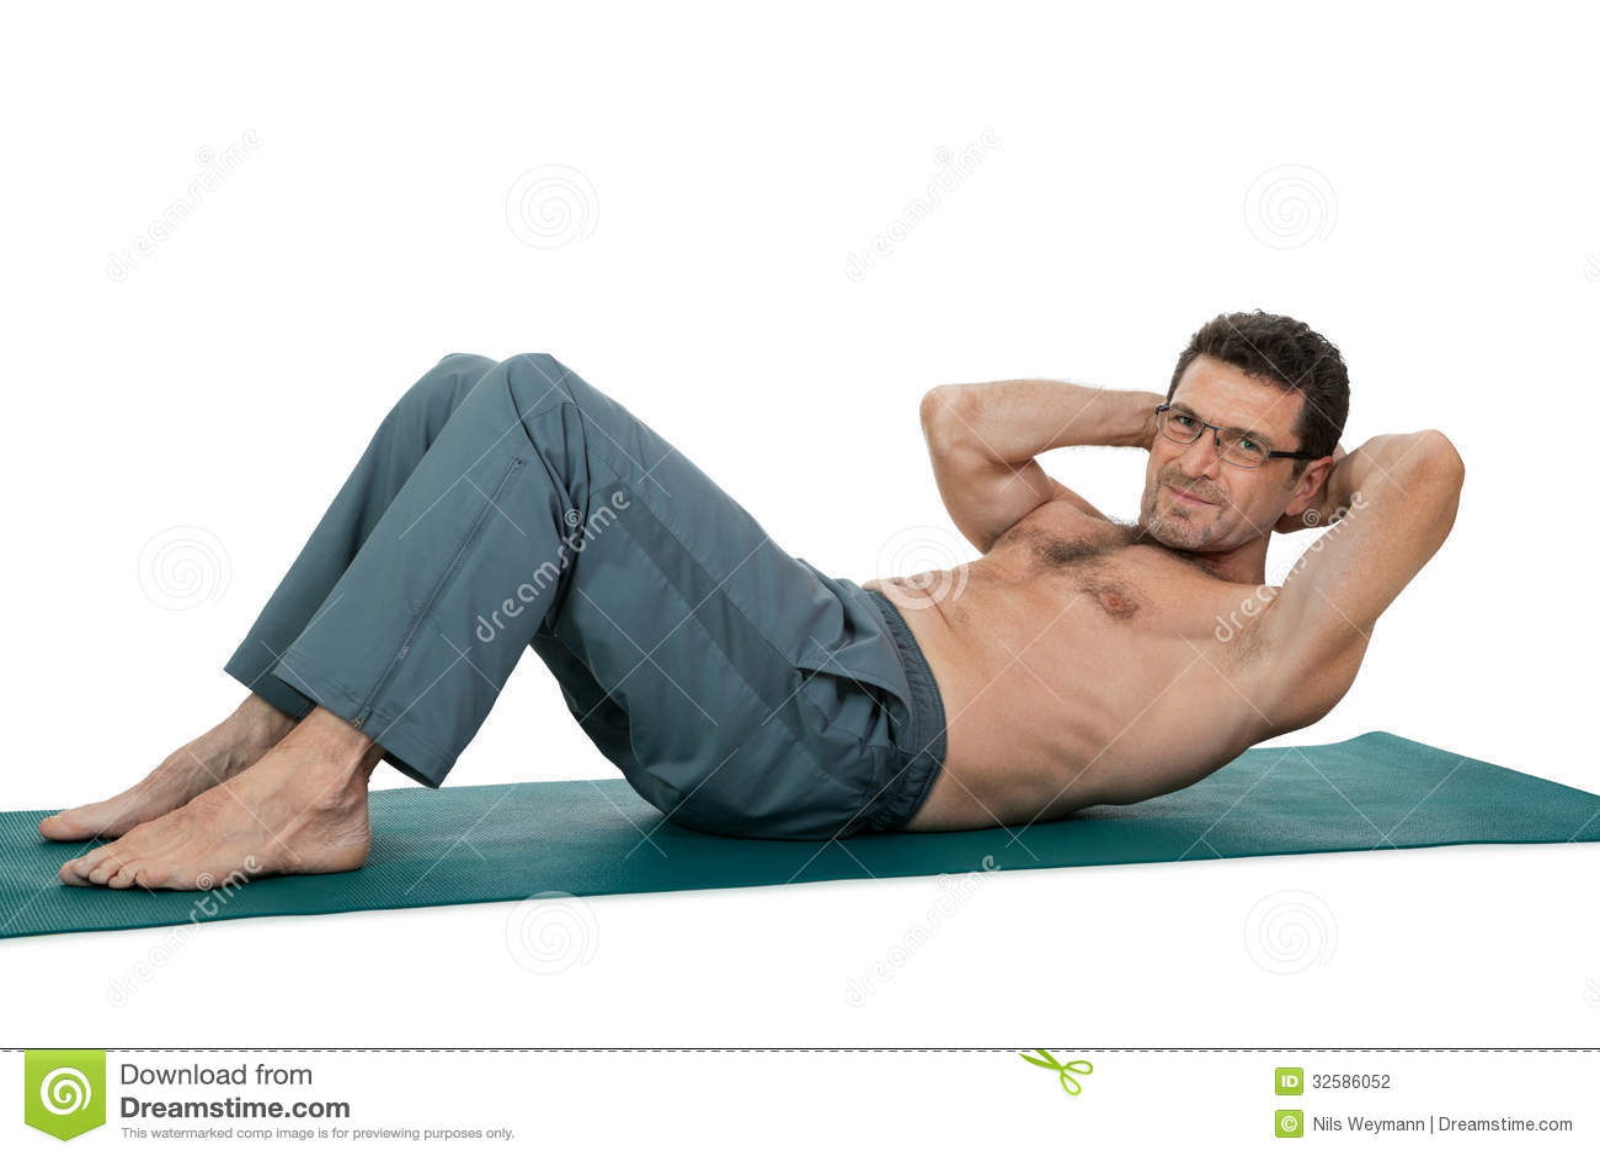 adult sports & fitness